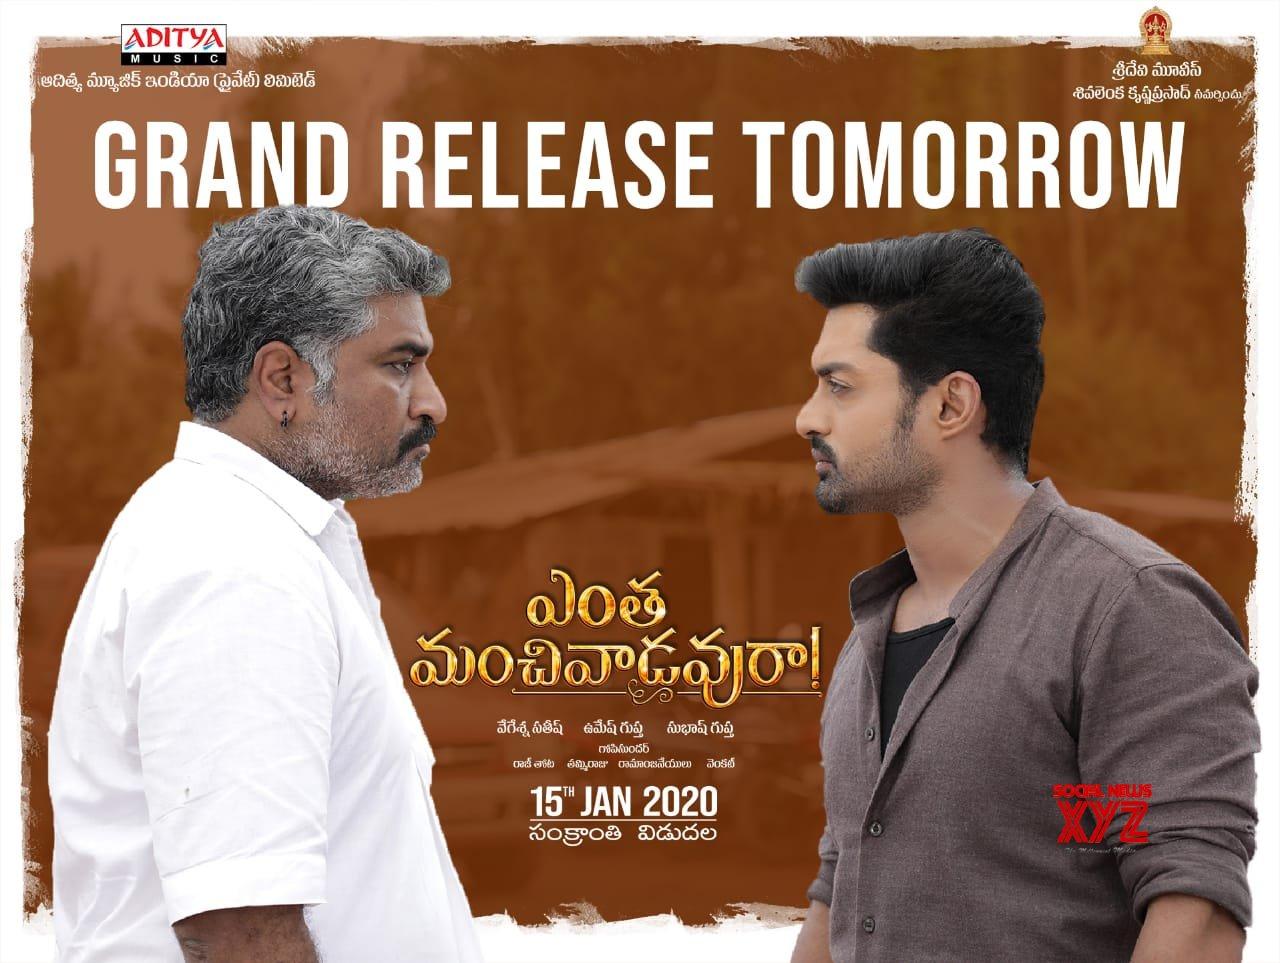 Entha Manchivaadavuraa Movie Grand Release Tomorrow Poster